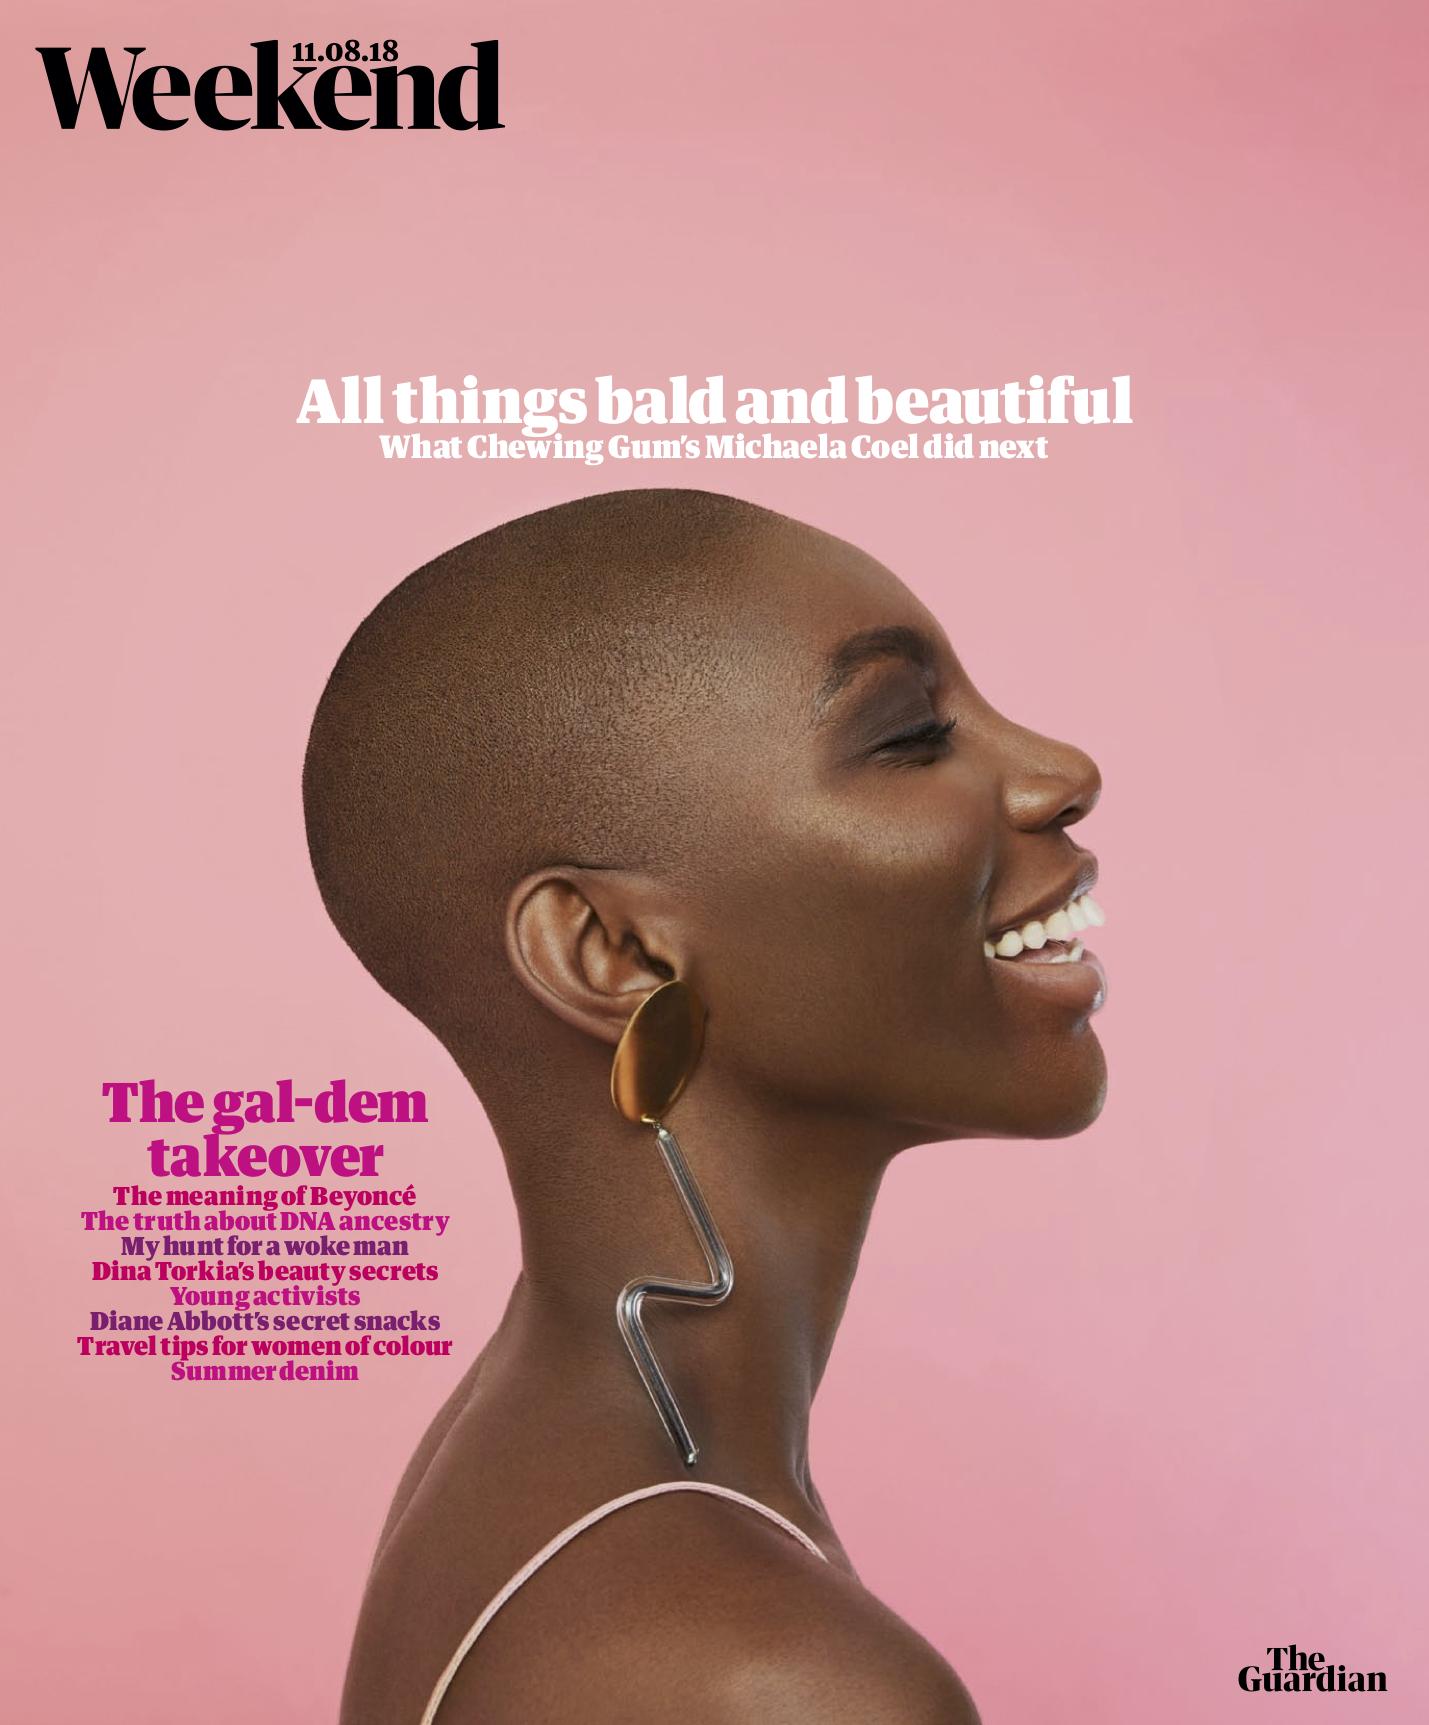 Cover 11 Aug.jpg